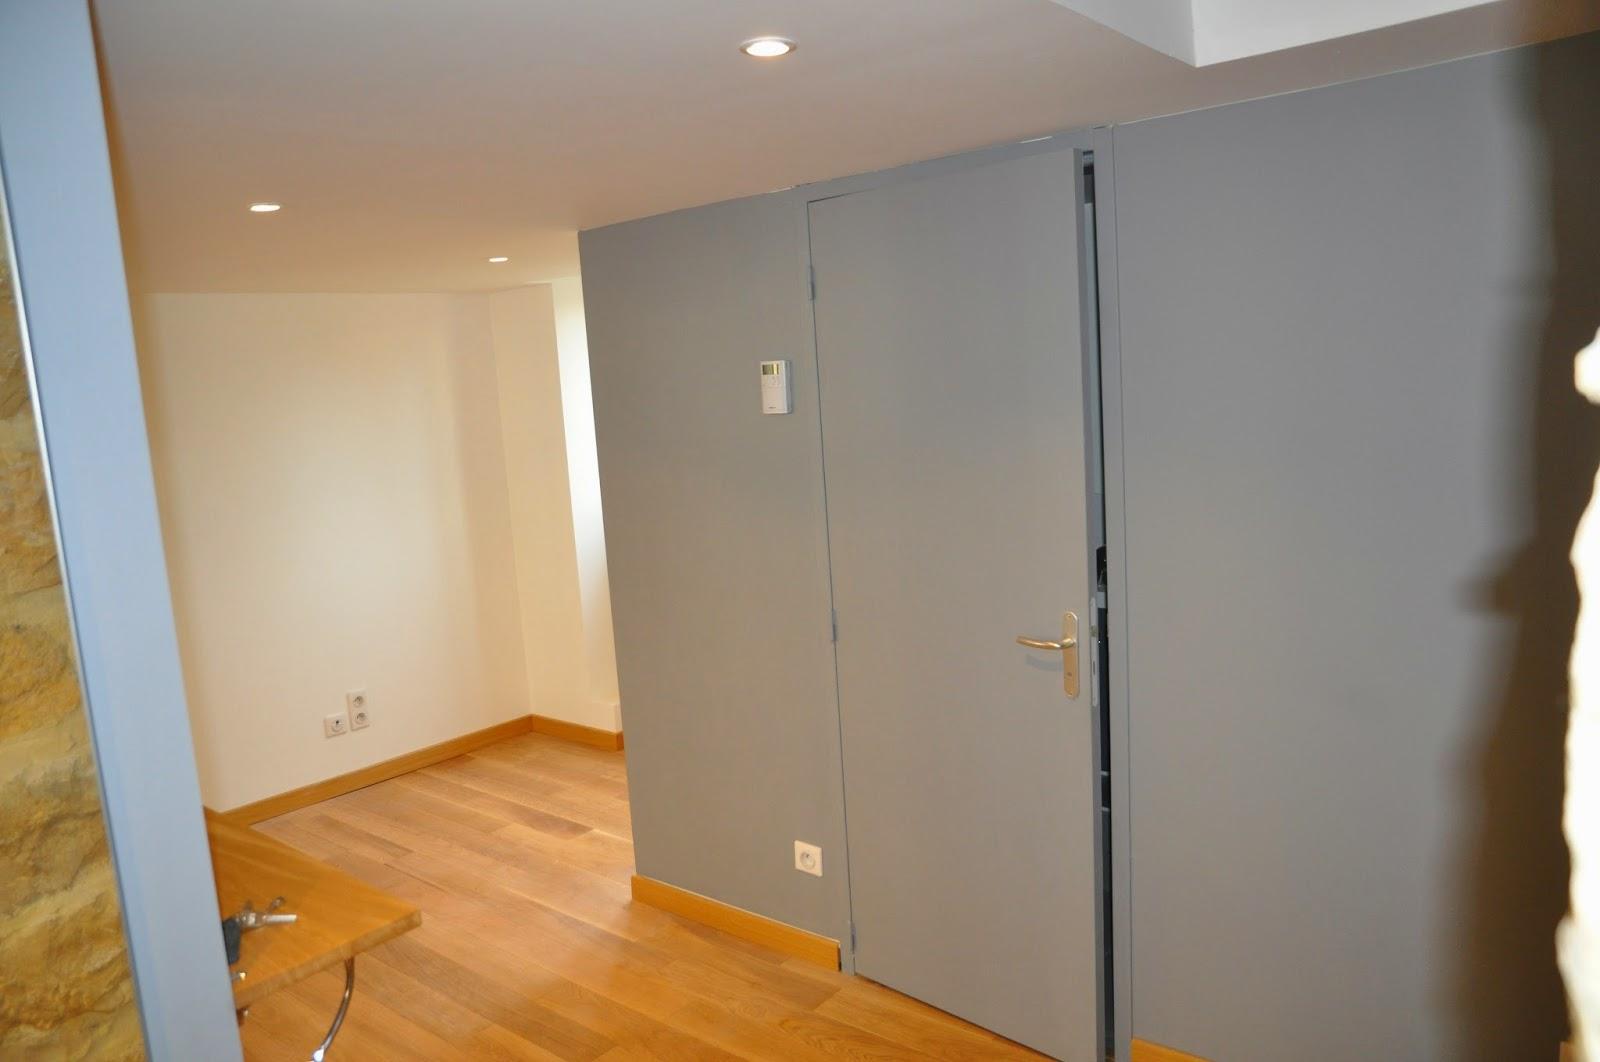 indoordesign architecture d 39 int rieur lyon gigodot 110m2 r agencement de canut livr. Black Bedroom Furniture Sets. Home Design Ideas